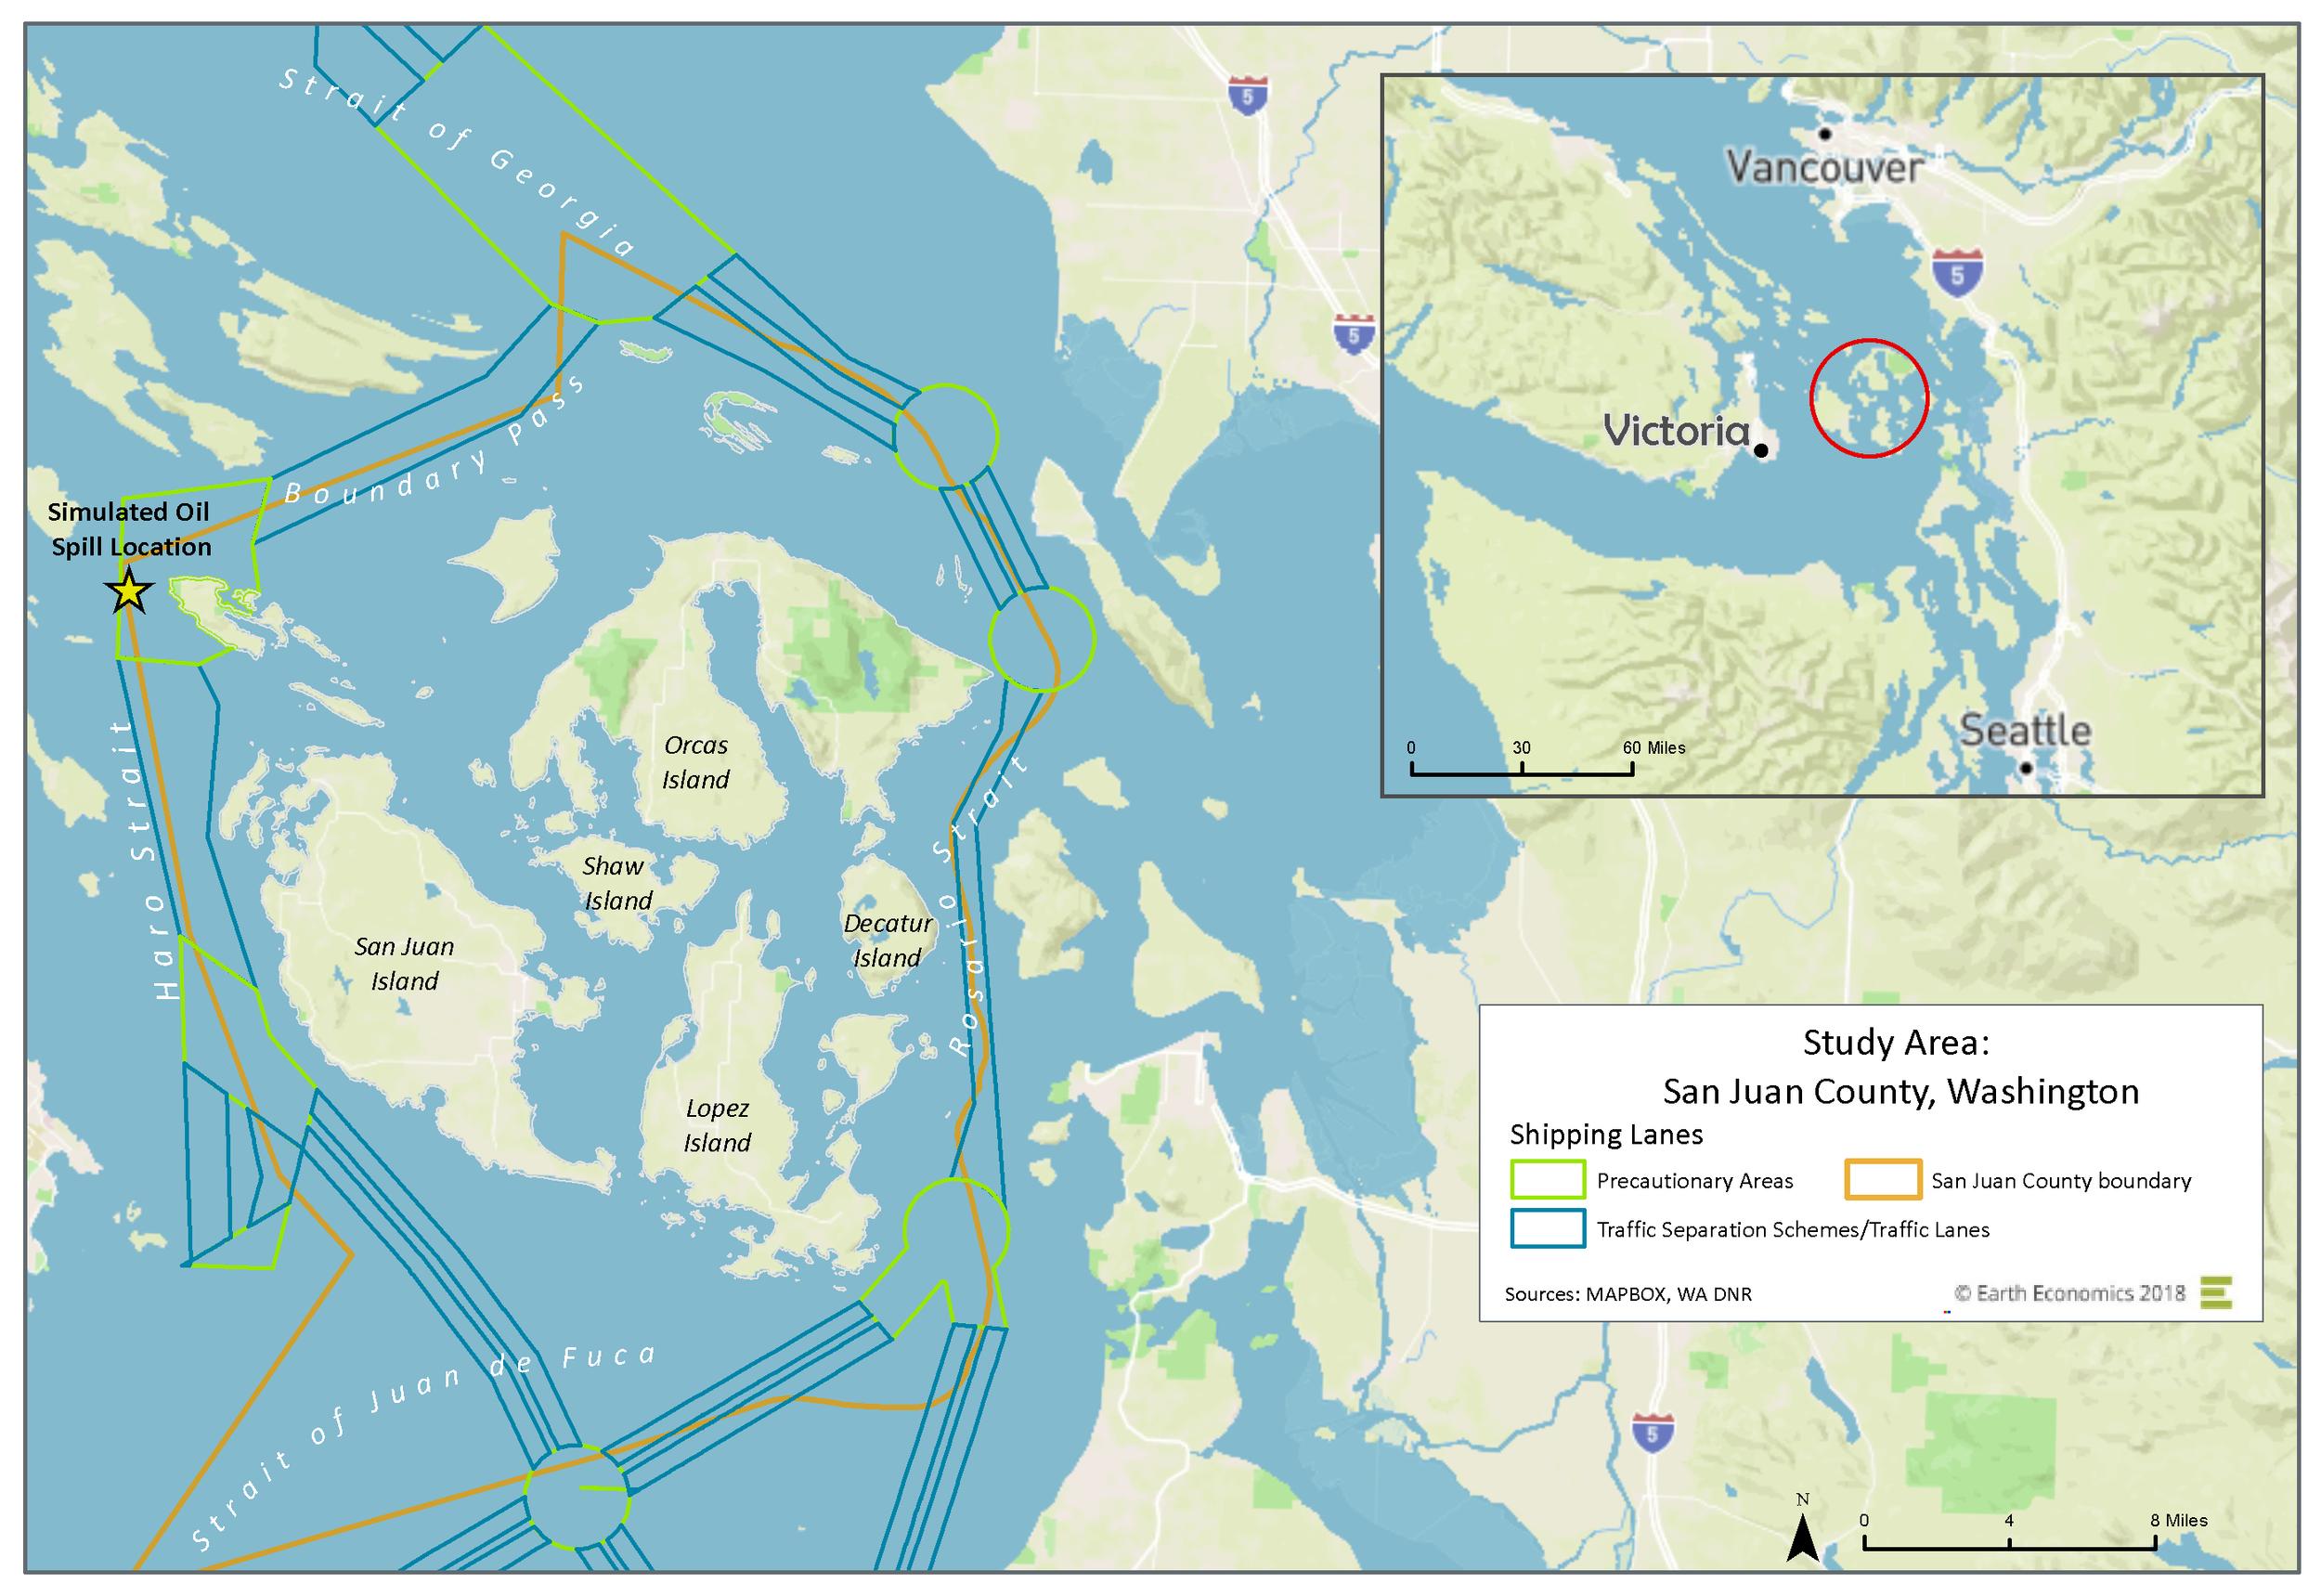 Study Area: San Juan County, Washington    Click Image to Enlarge